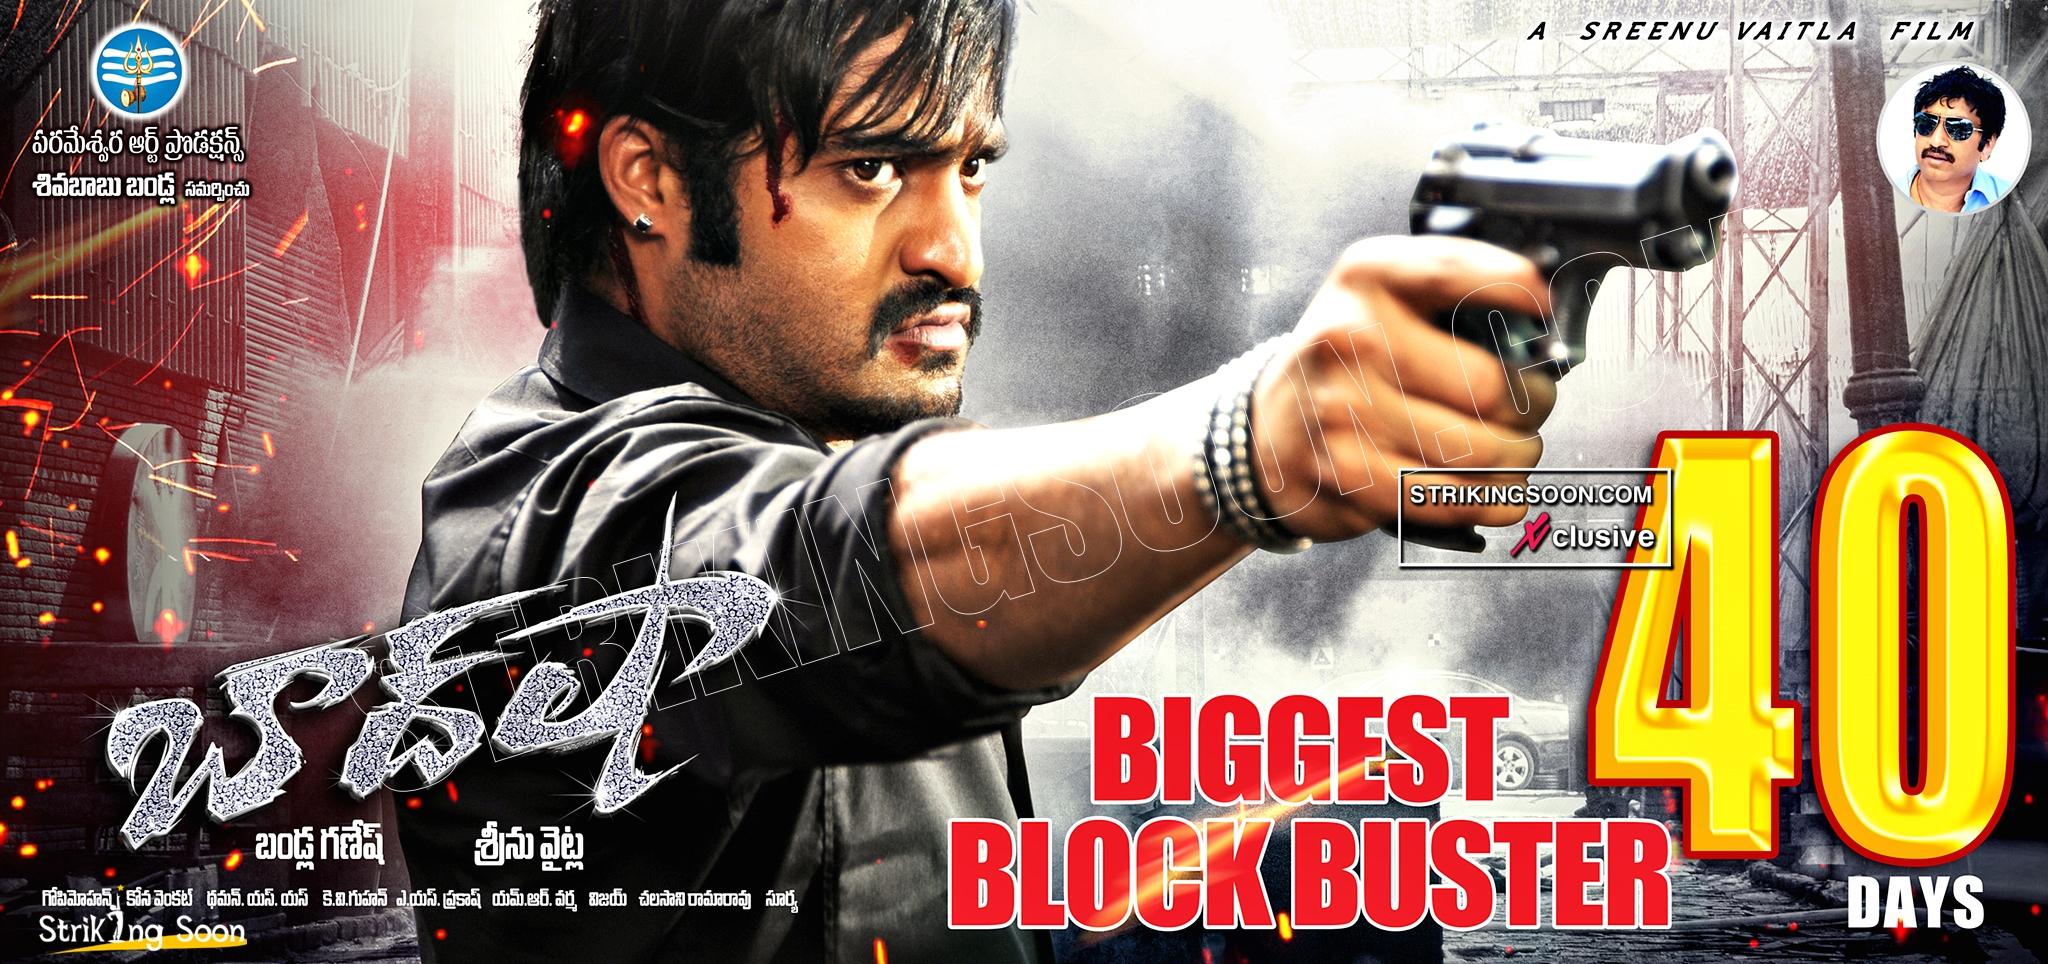 Baadshah Biggest BlockBuster Posters ~ StrikingSoon.com Baadshah 2013 Posters